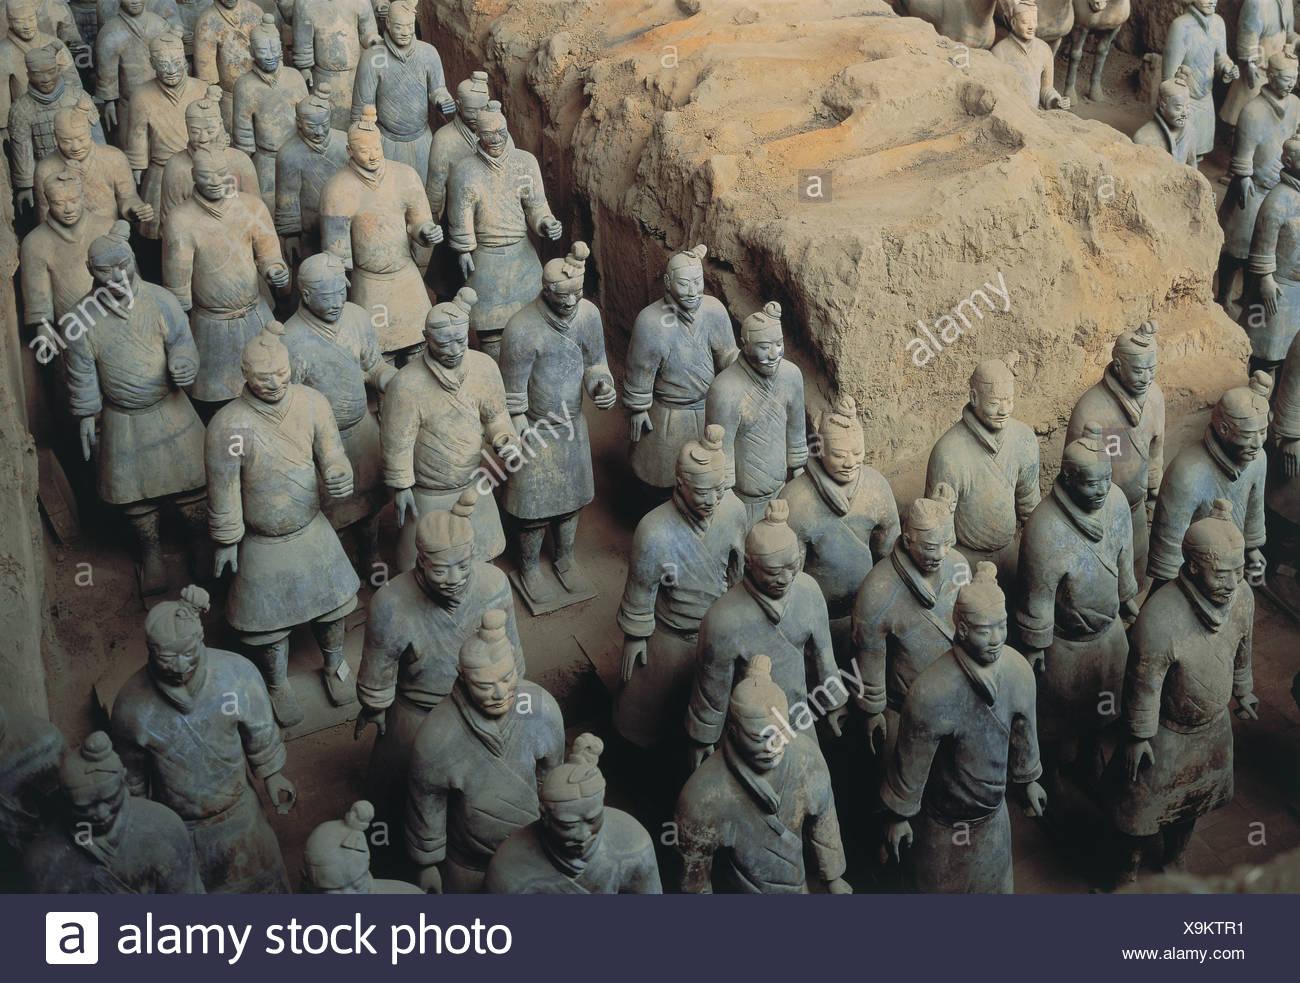 Terracotta Warriors, Xi'an, Shaanxi Privince, China Stock Photo